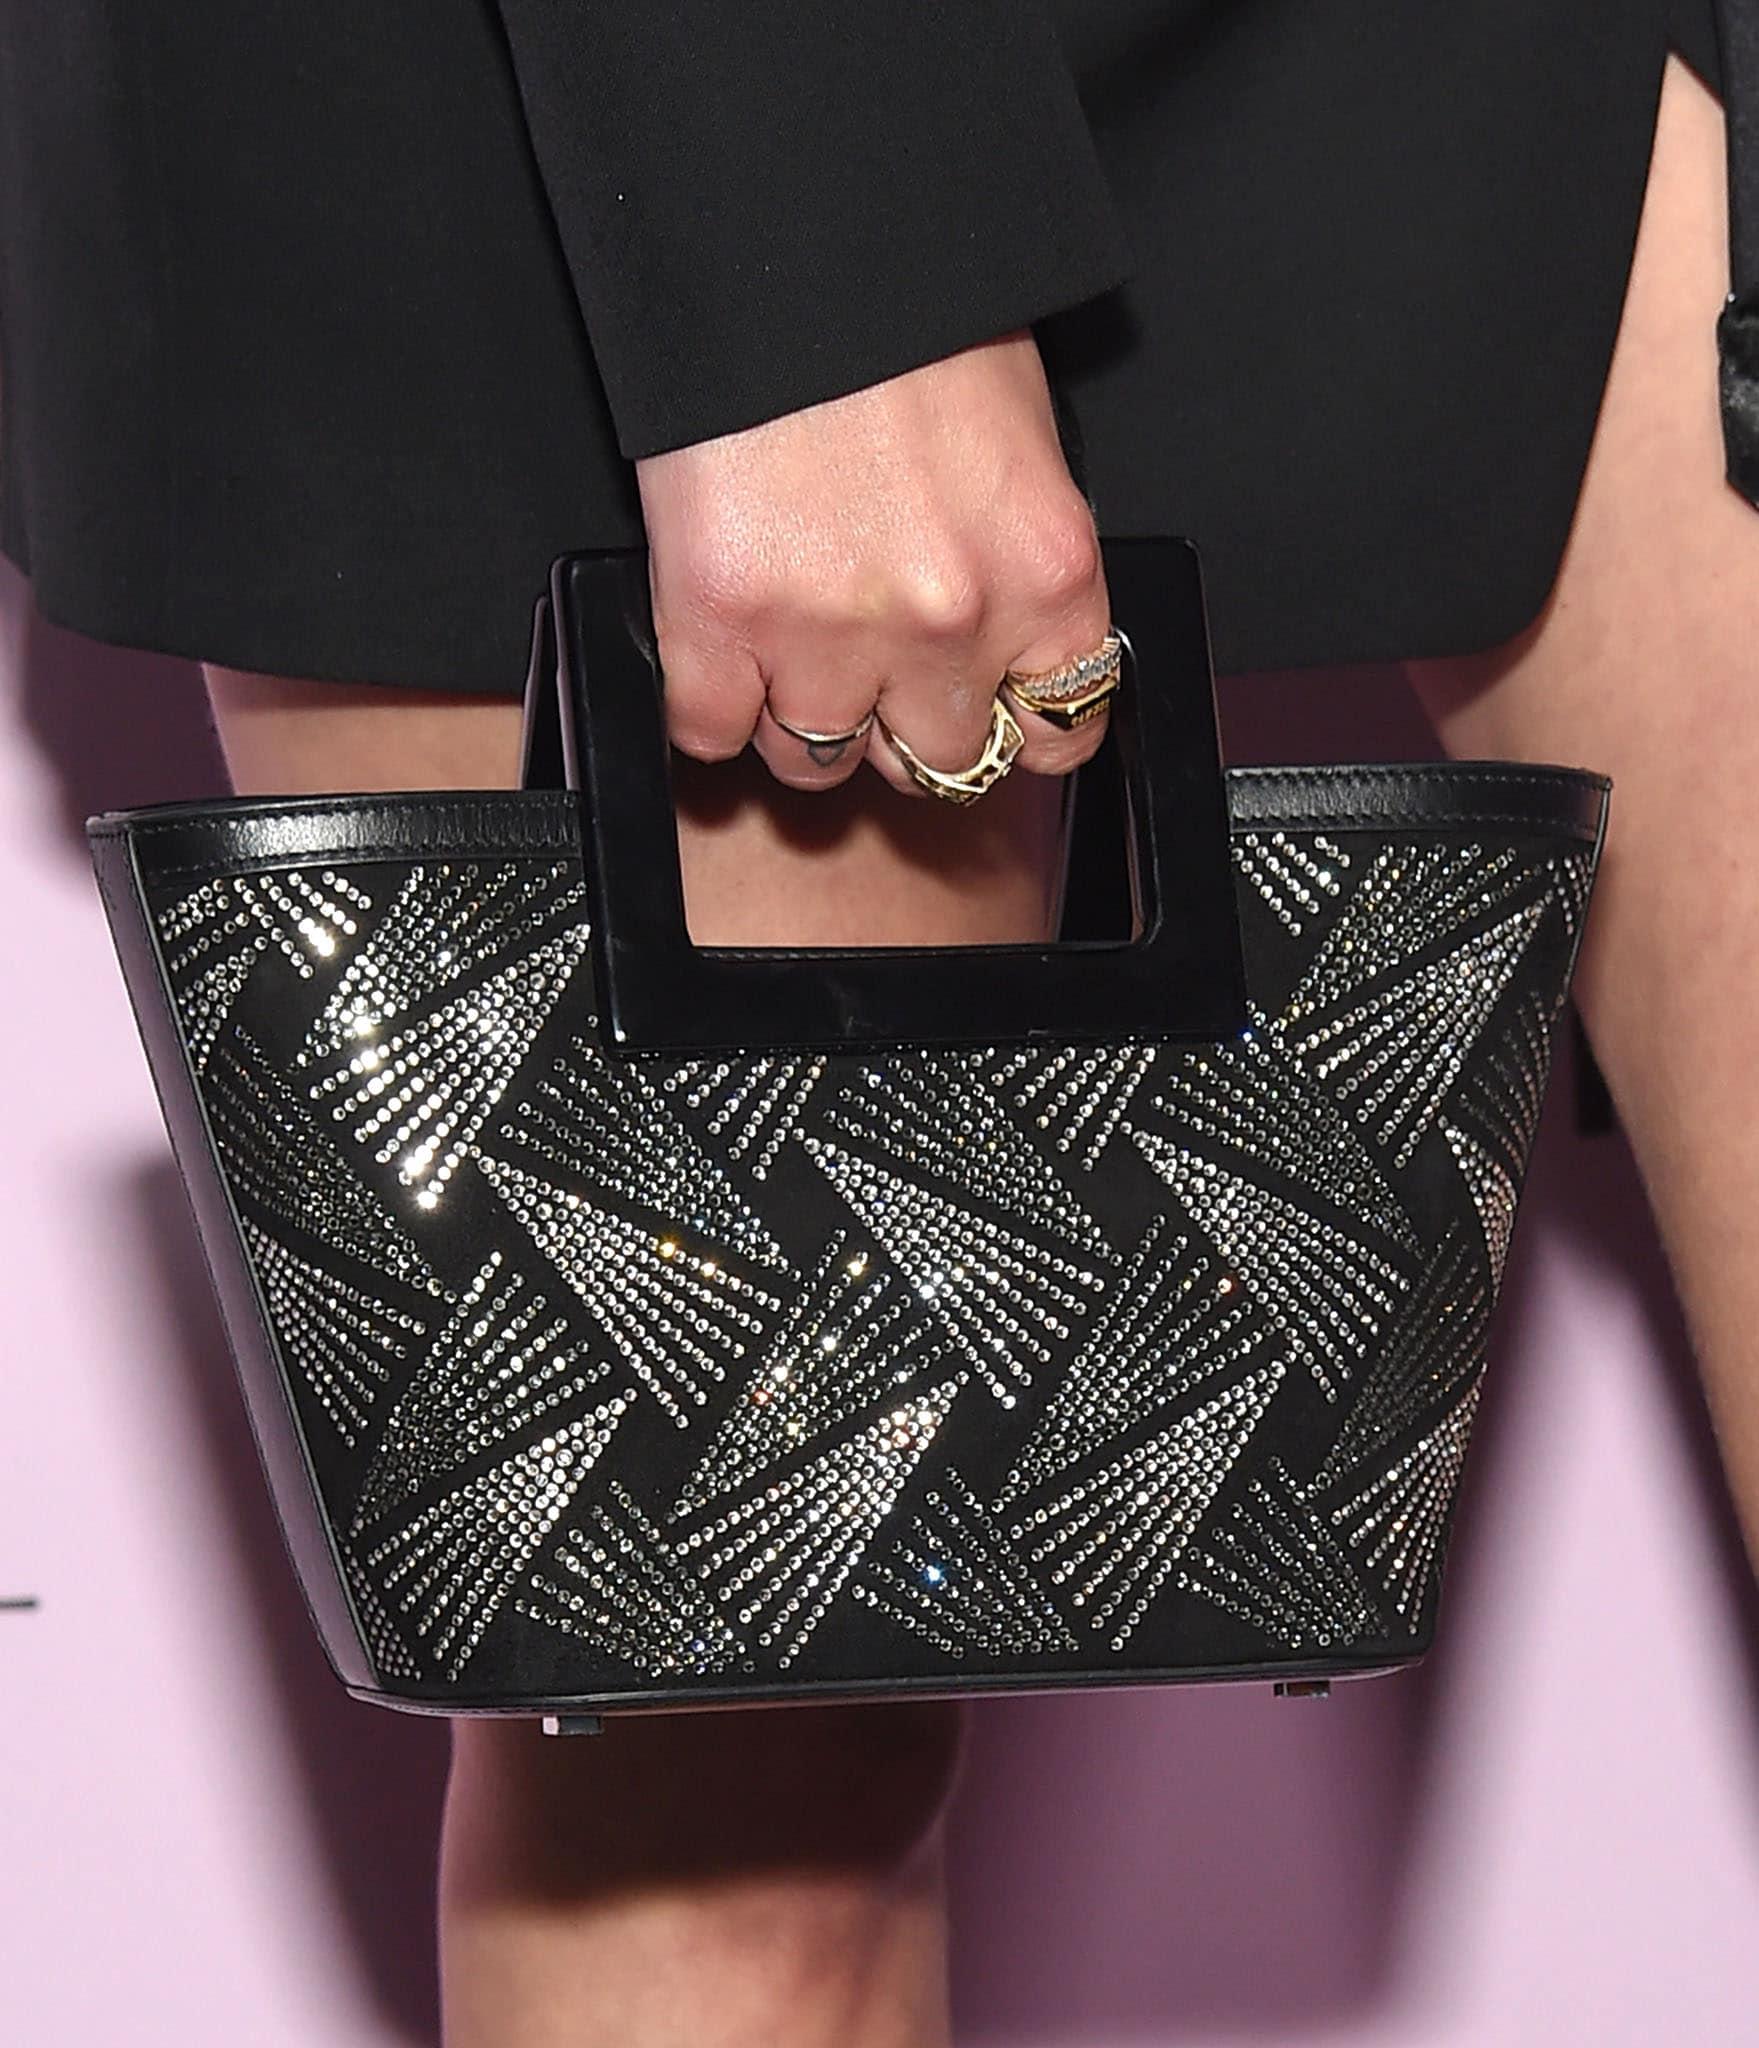 Ashley Benson carries the fireworks-patterned Swarovski Micro Riviera bag from Marina Raphael